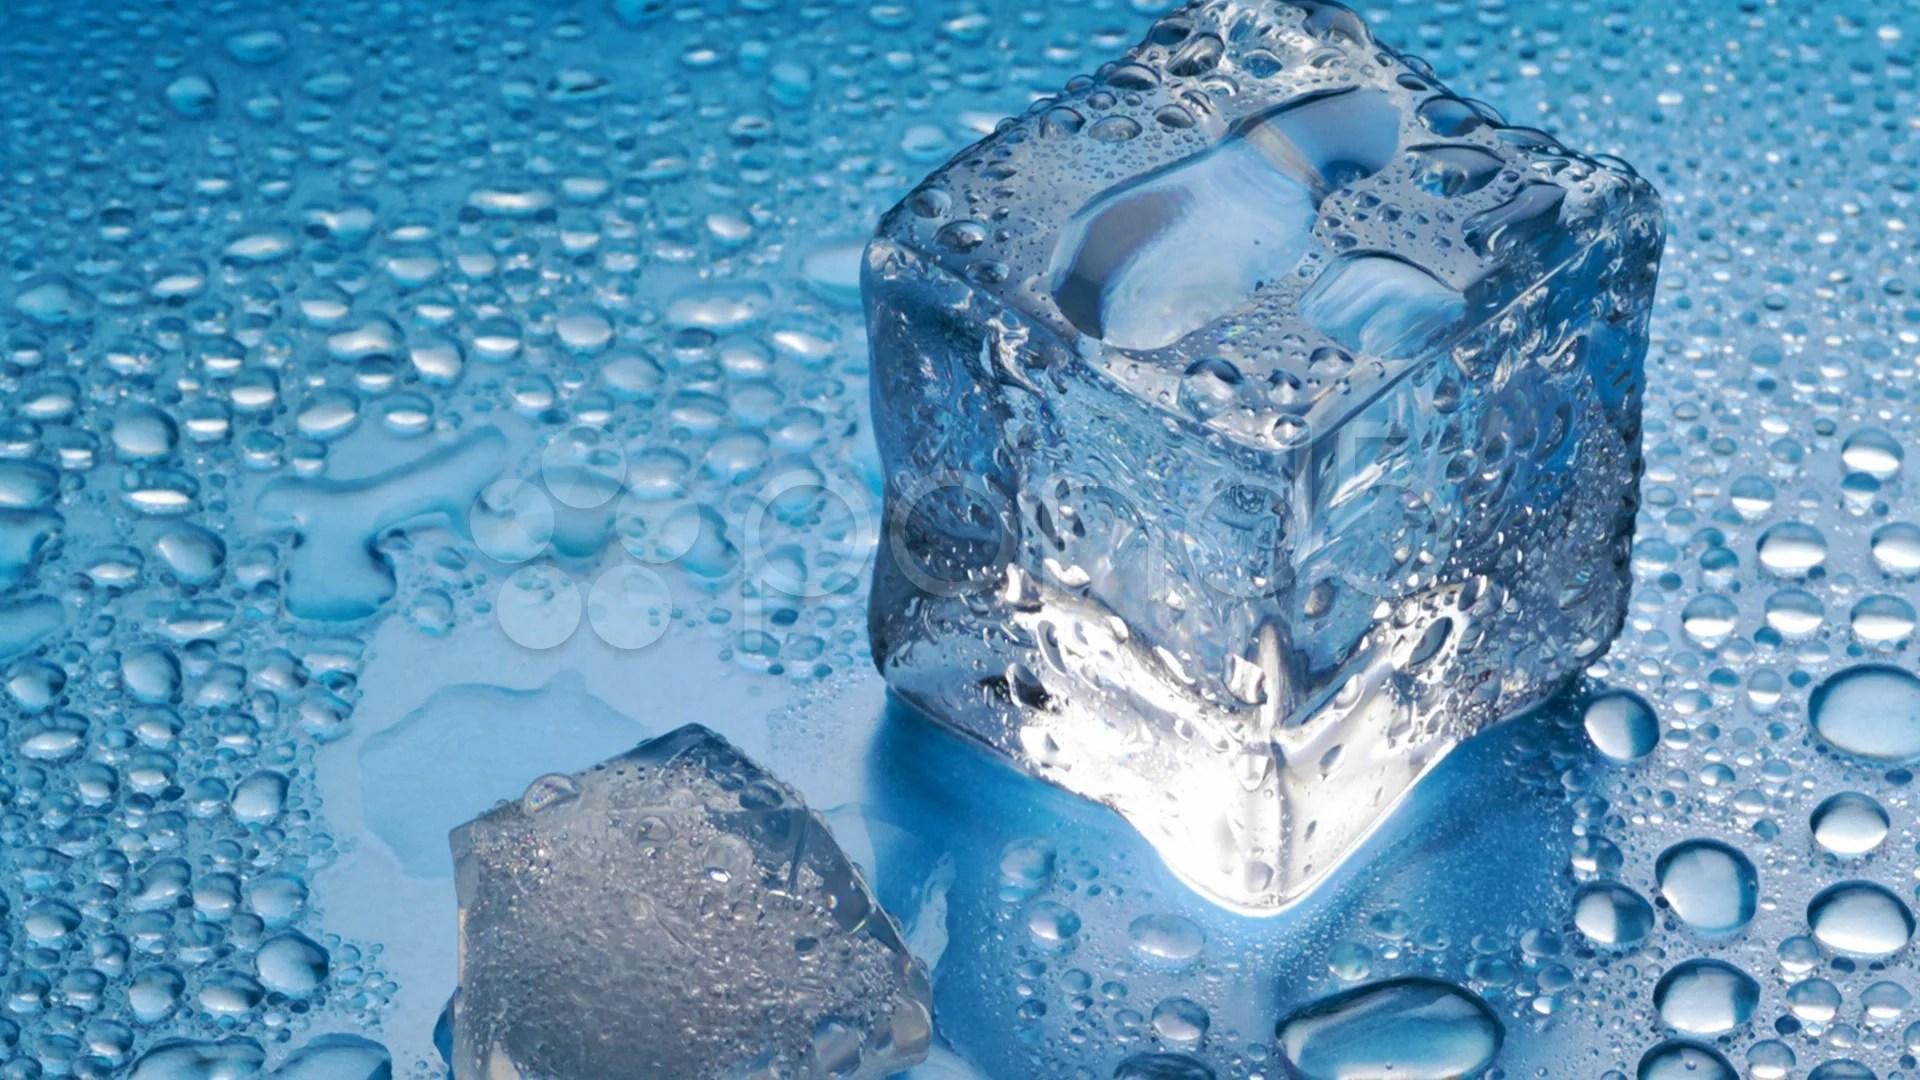 3d Cube Desktop Wallpaper Melting Ice Cube On Blue Background Stock Video 8697075